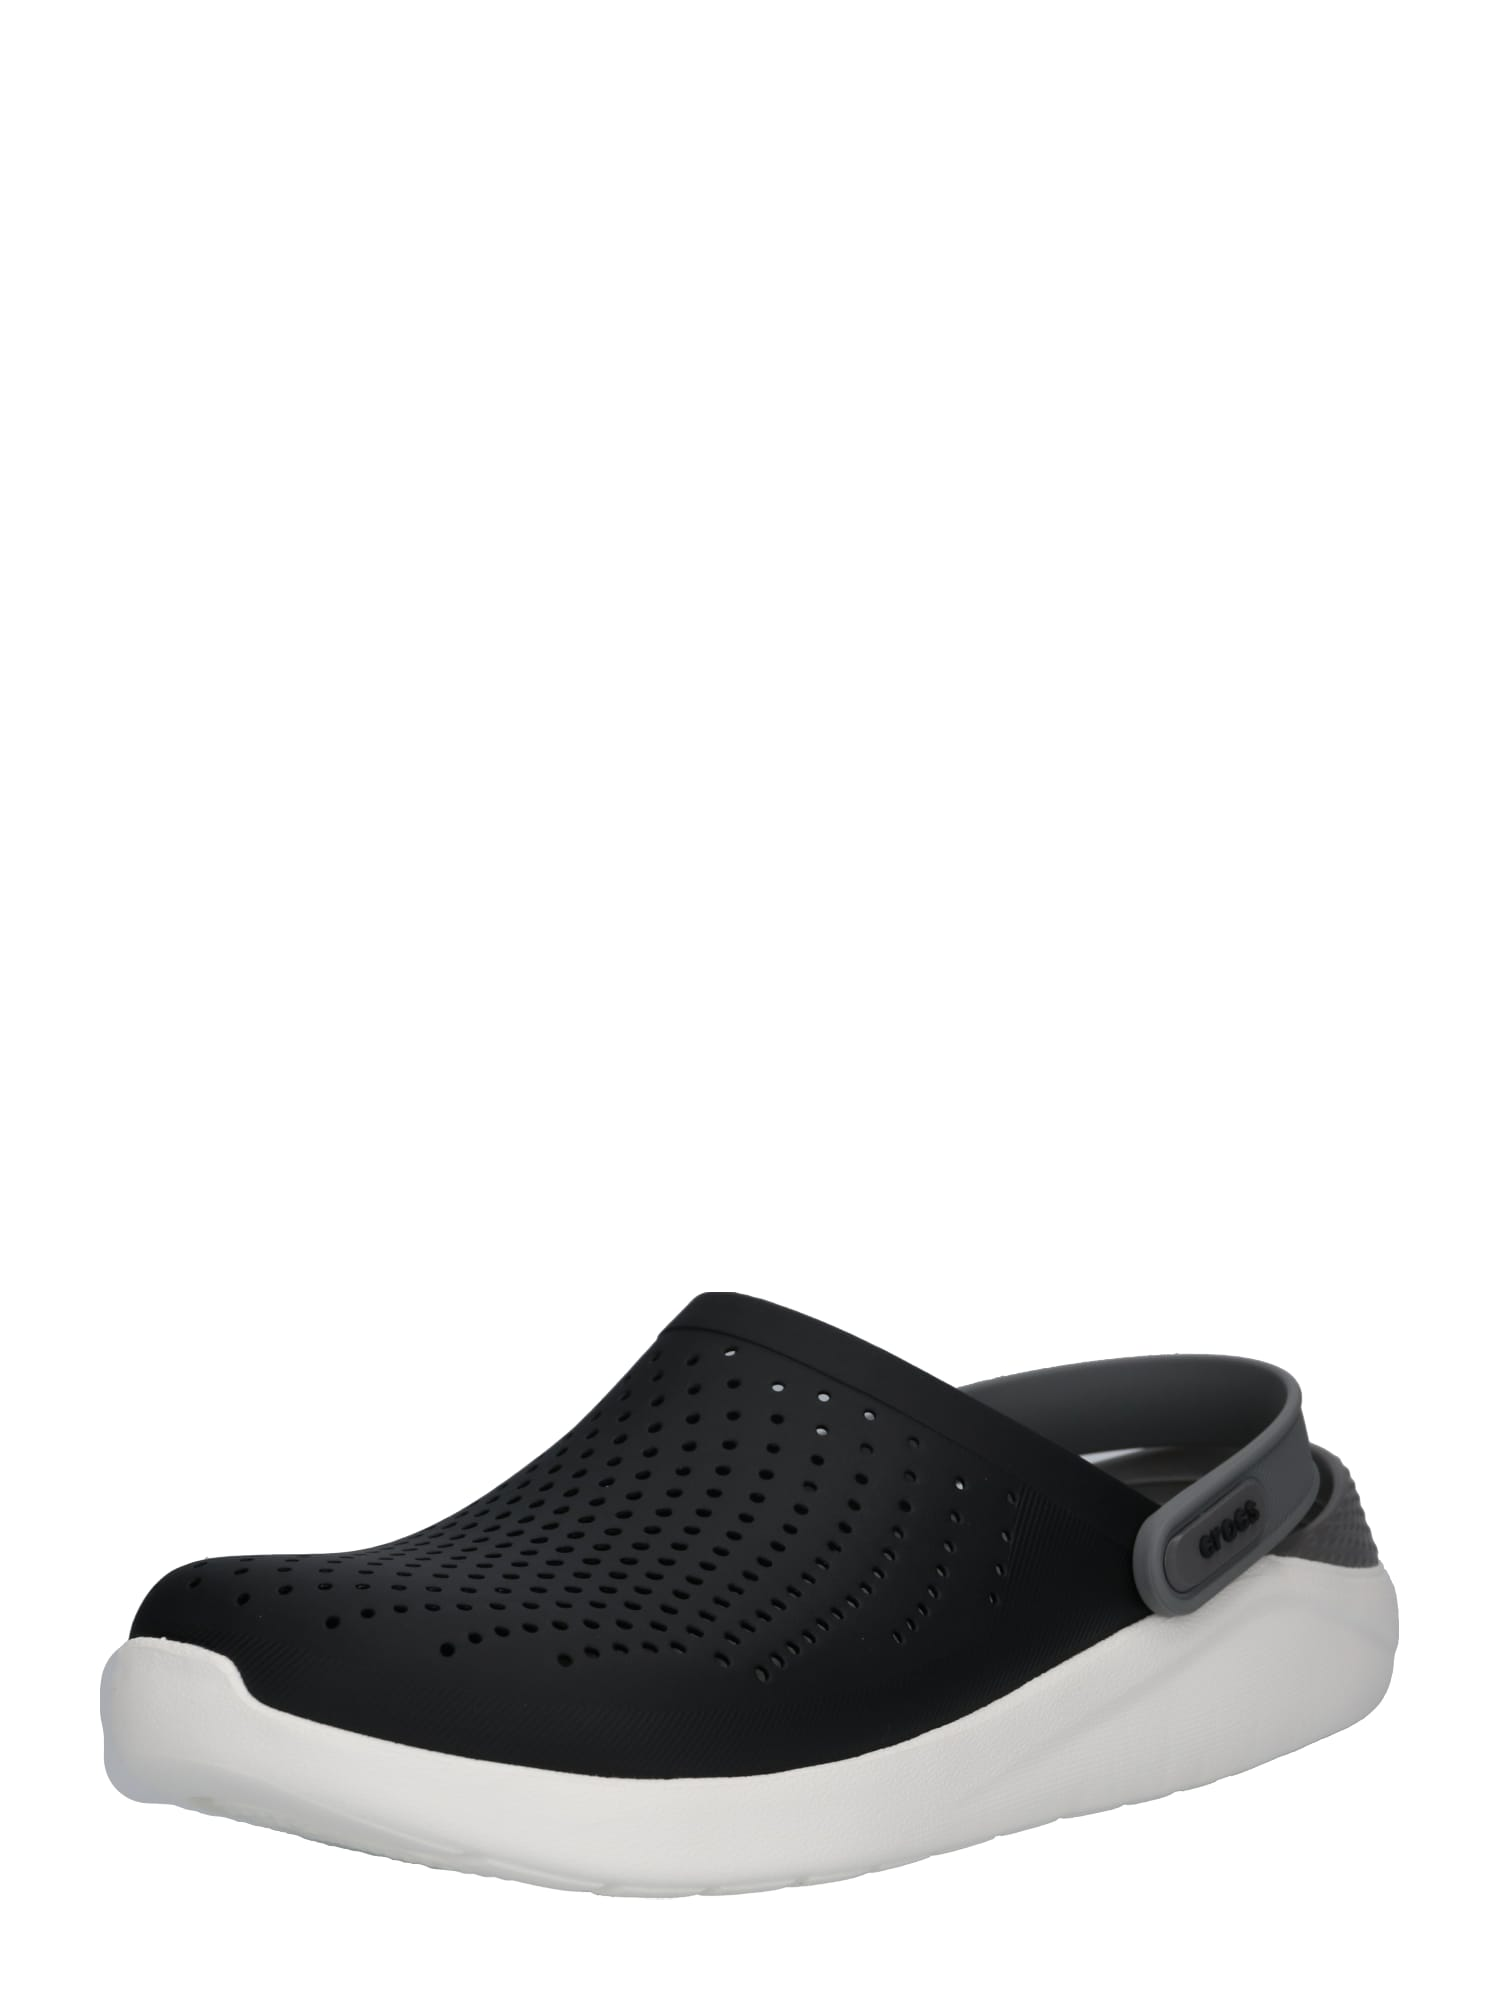 Pantofle Rite Lite černá Crocs